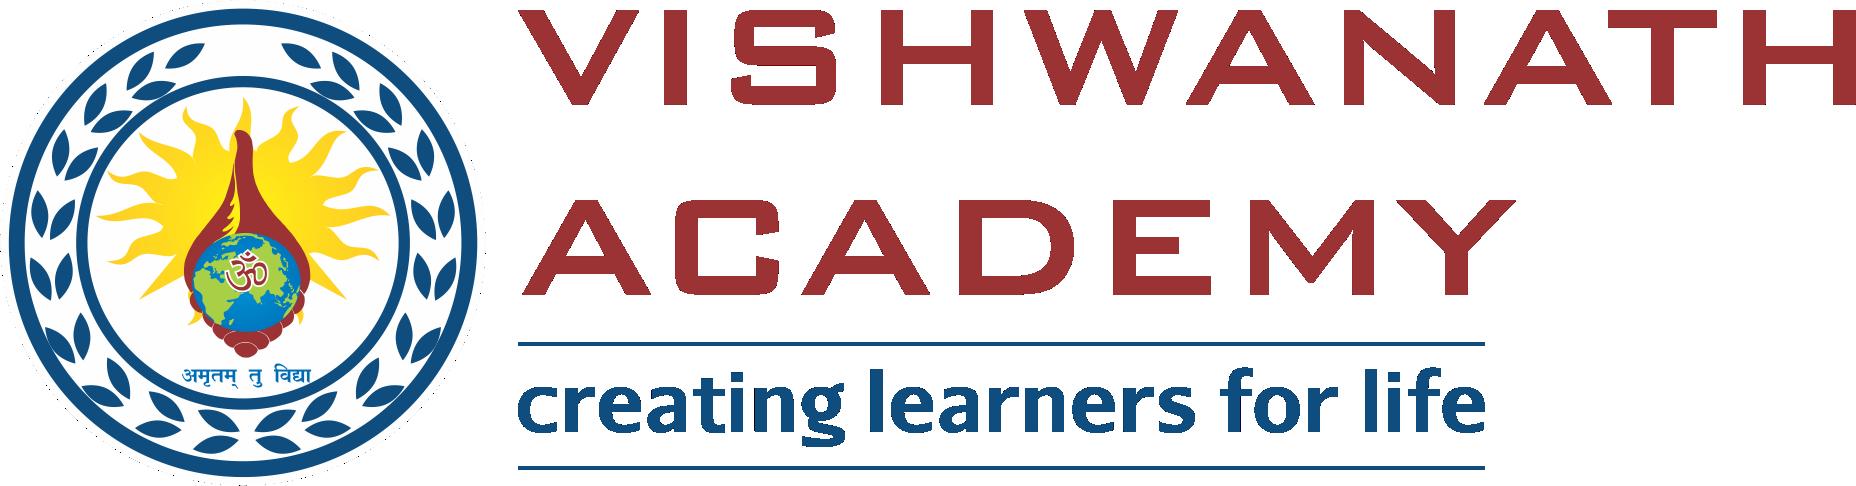 Vishwanath Academy